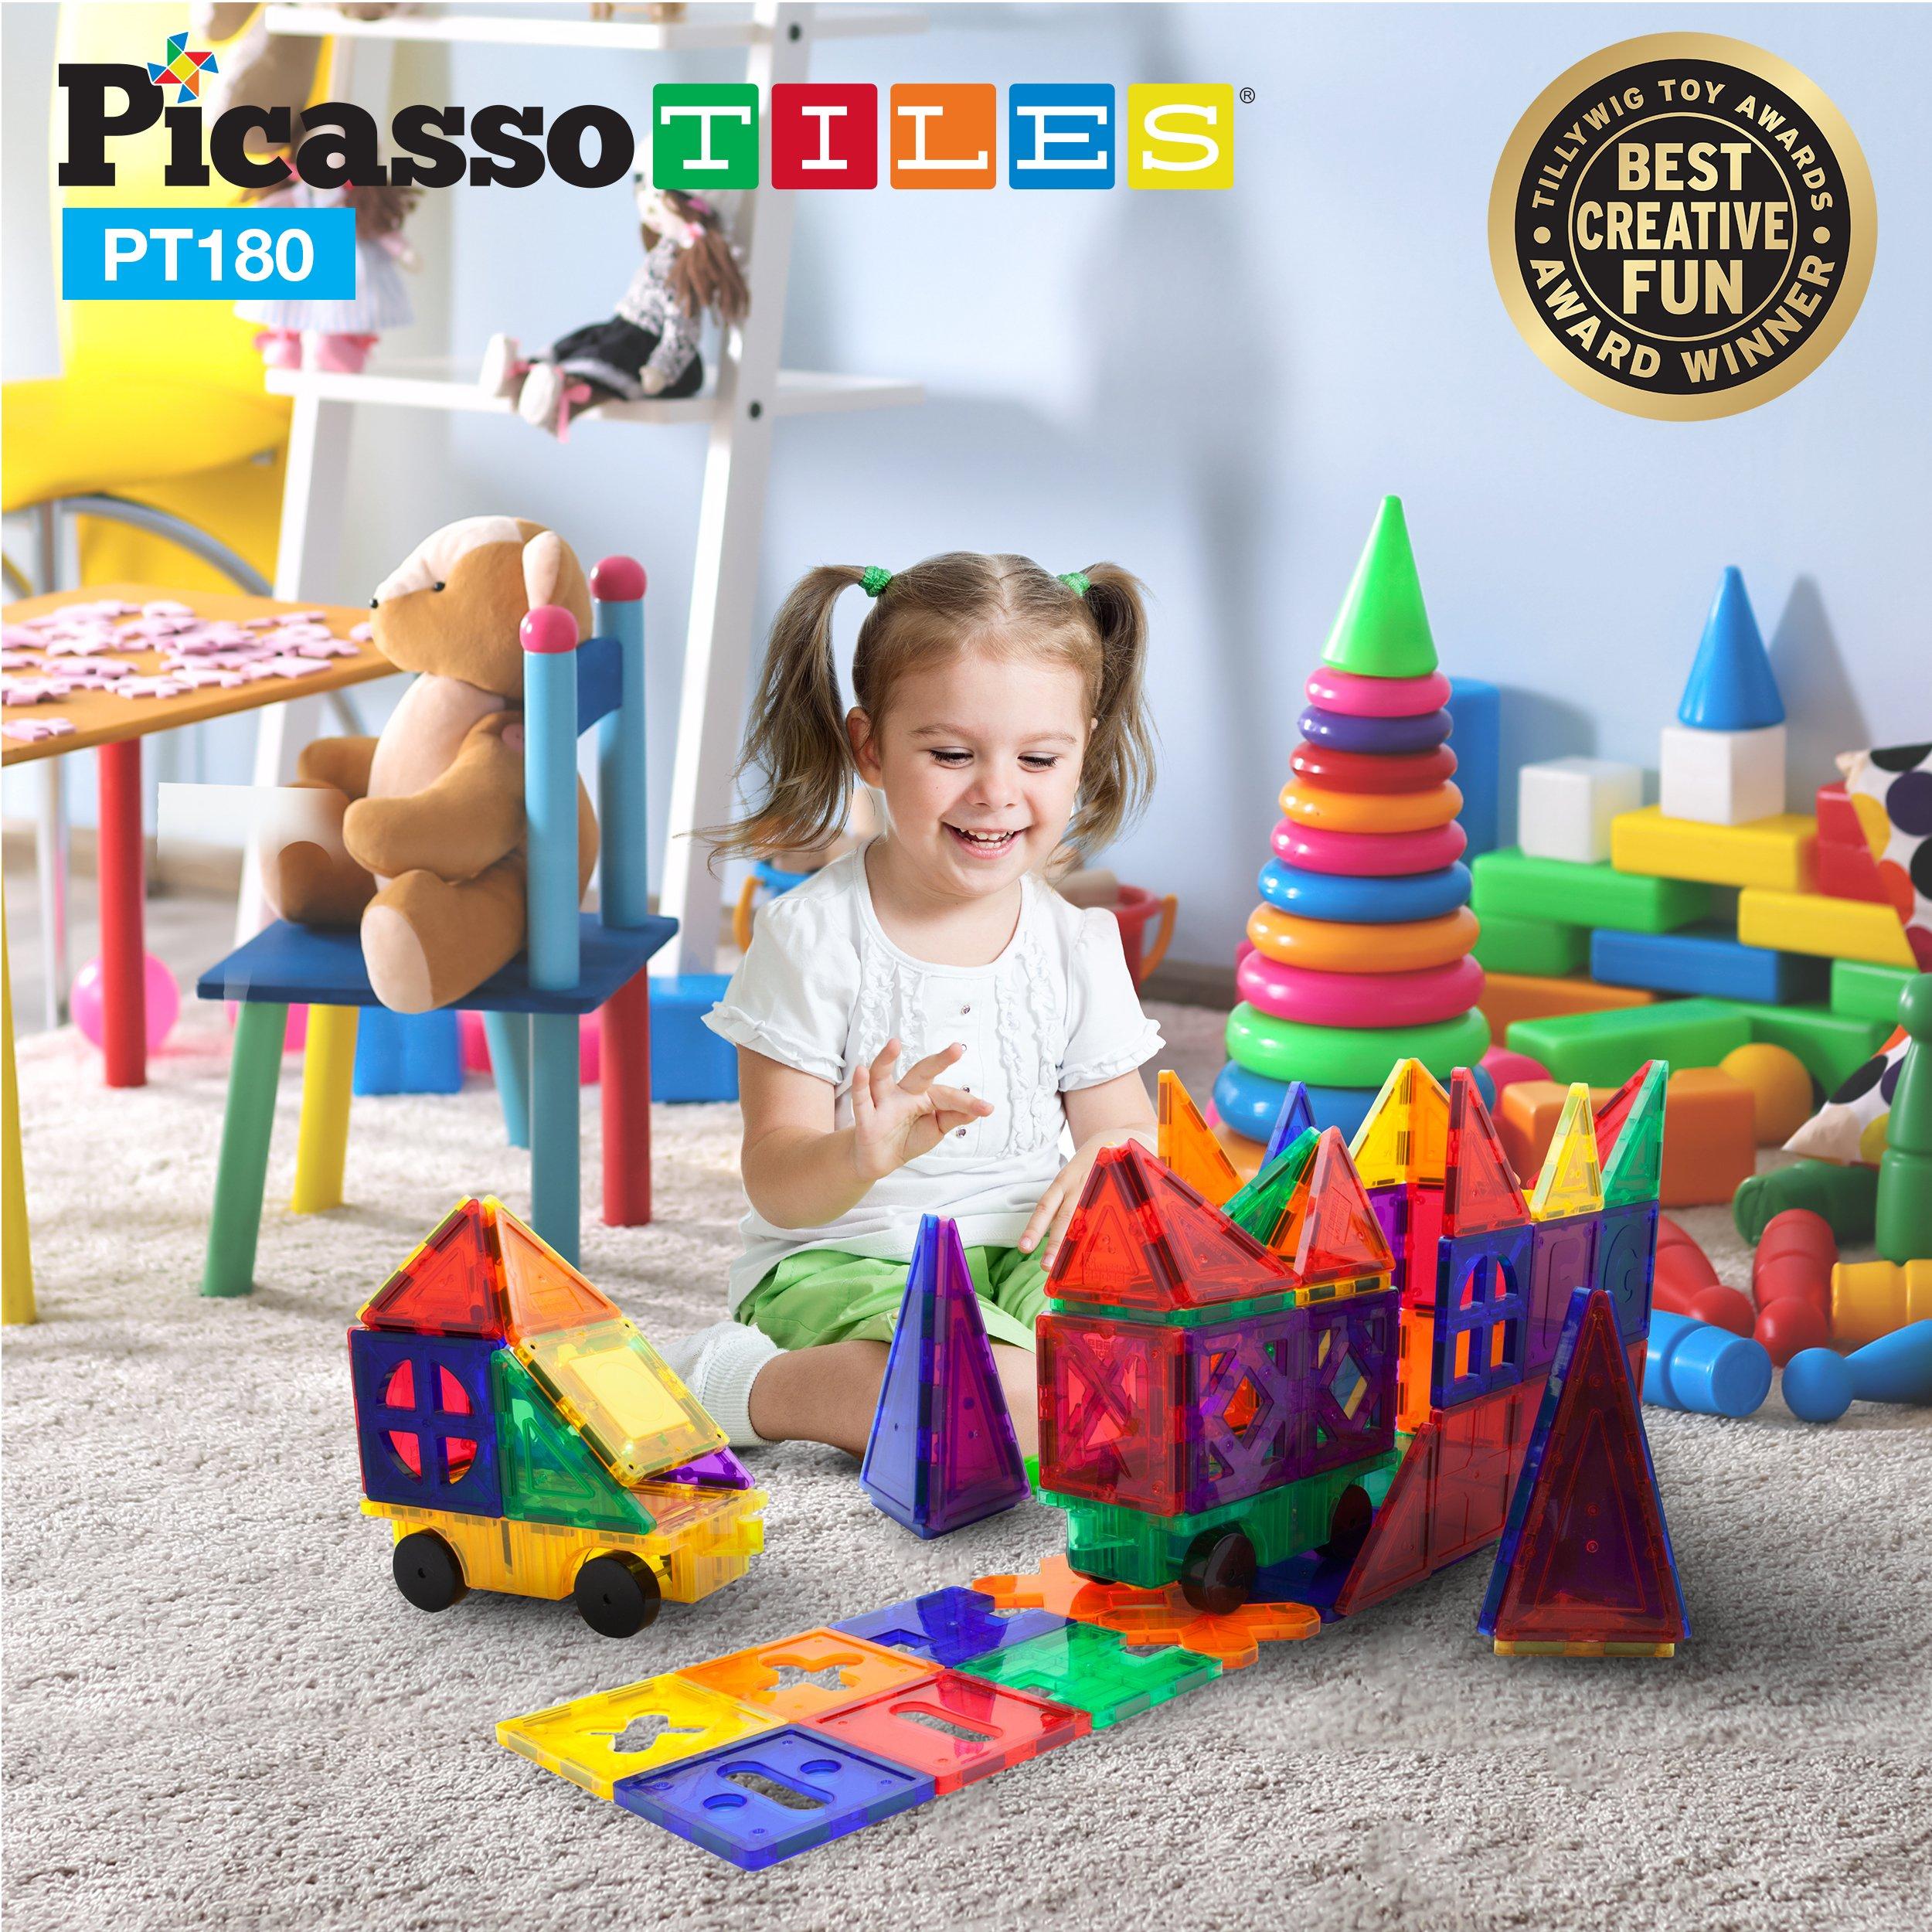 PicassoTiles PT180 Piece Set 180pc Building Block Toy Deluxe Construction Kit Magnet Building Tiles Clear Color Magnetic 3D Construction Playboards Educational Blocks Creativity Beyond Imagination by PicassoTiles (Image #9)